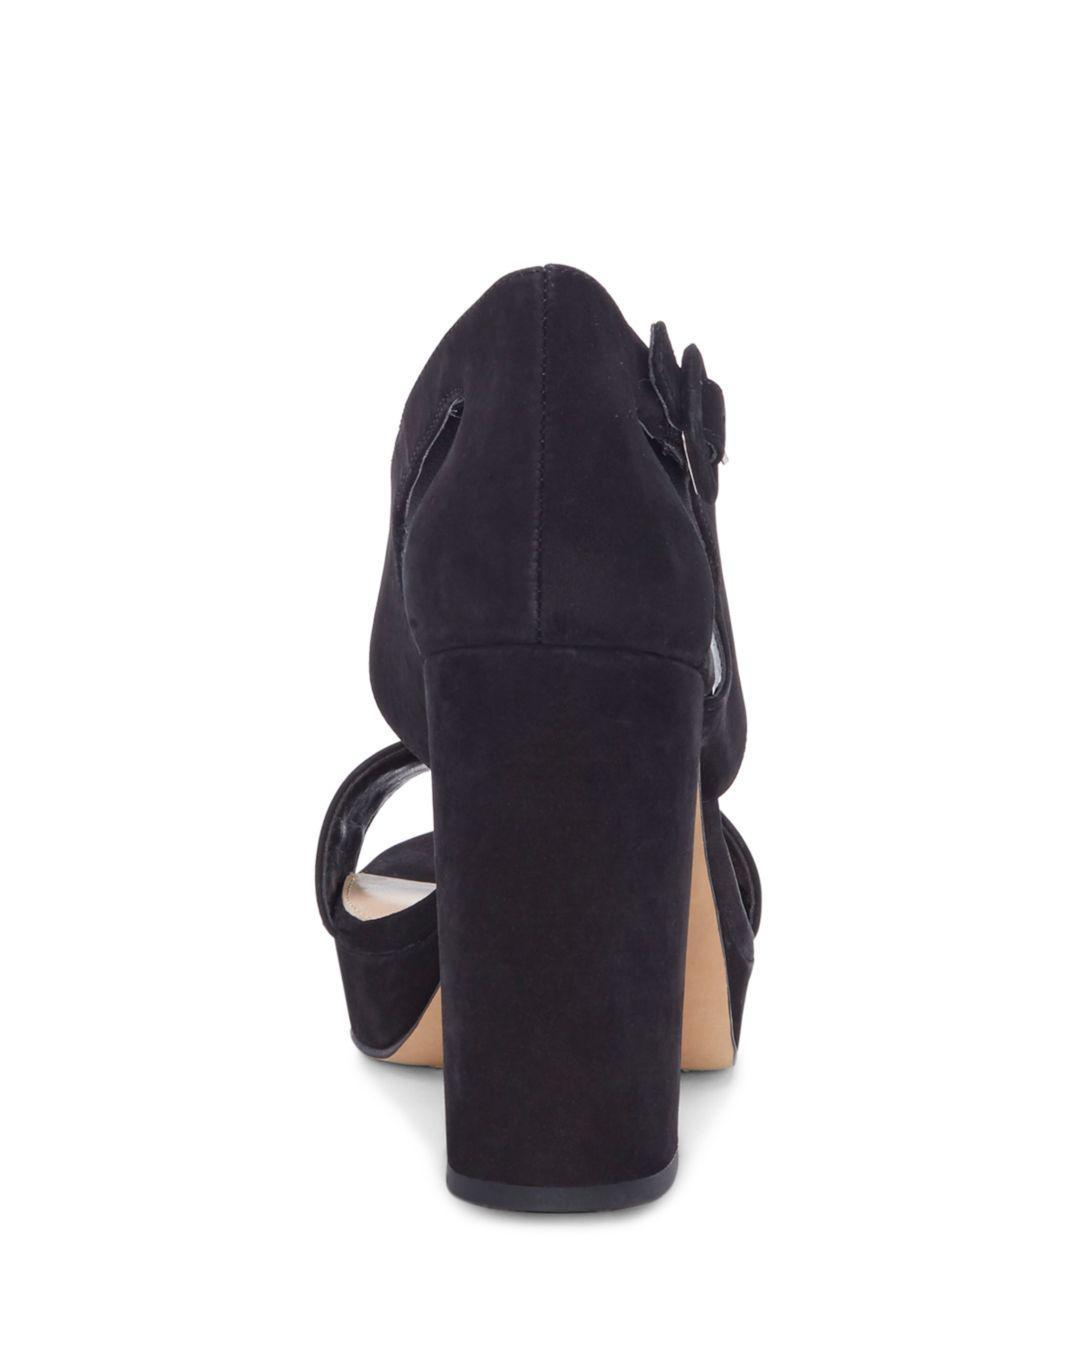 548e48be0bdc Vince Camuto - Black Women s Jayvid Suede Platform Sandals - Lyst. View  fullscreen